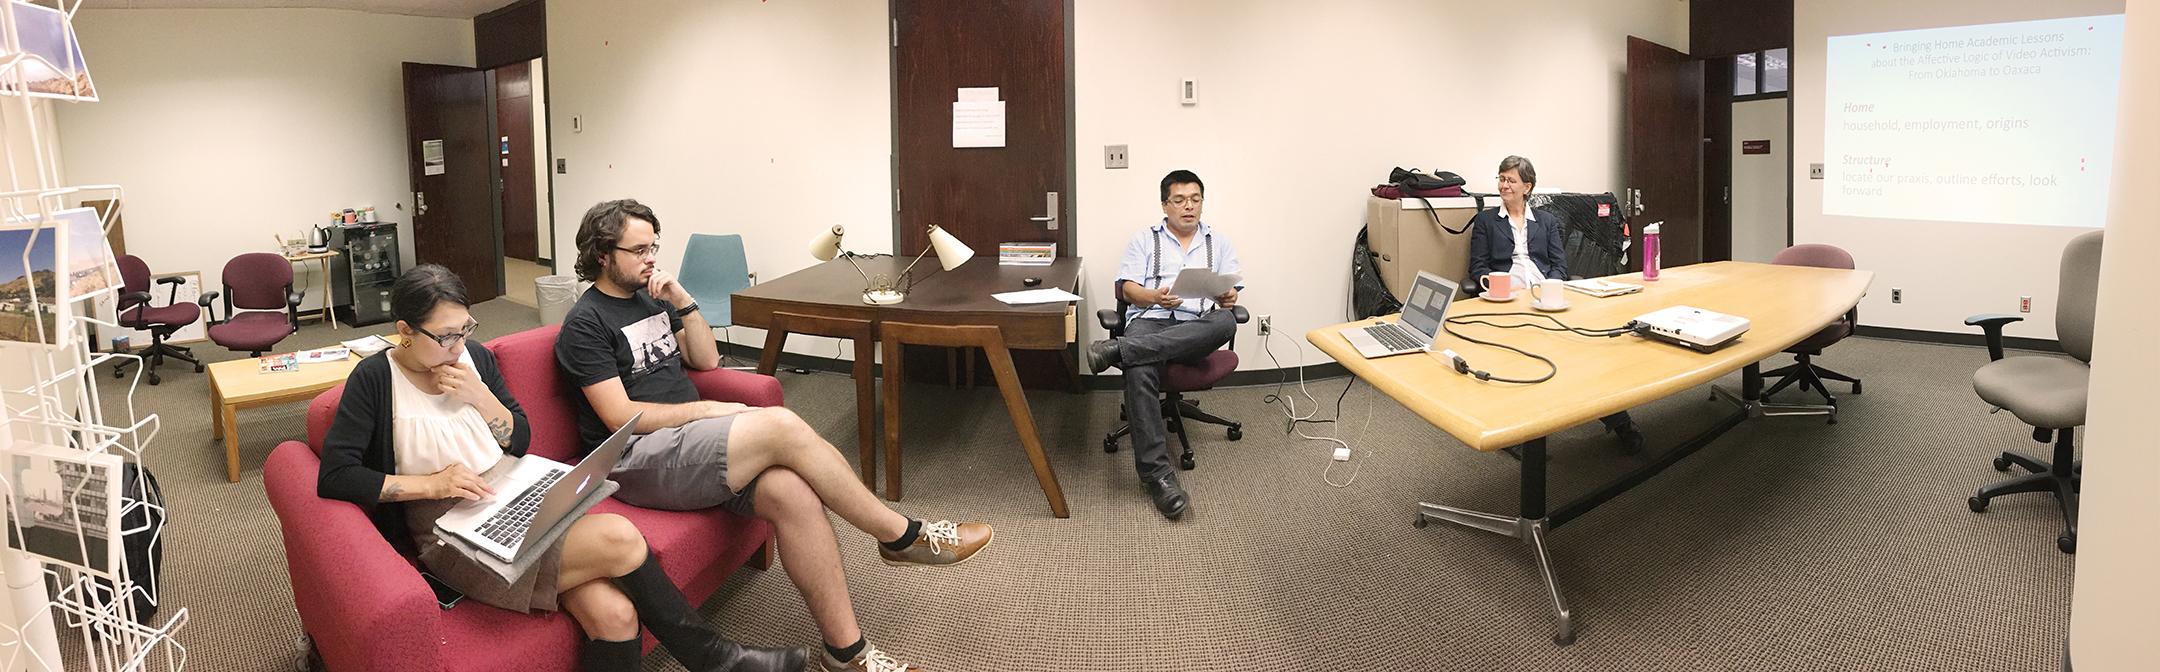 Filo Gomez presents his paper along with co-author Laurel Smith. 10/25/16